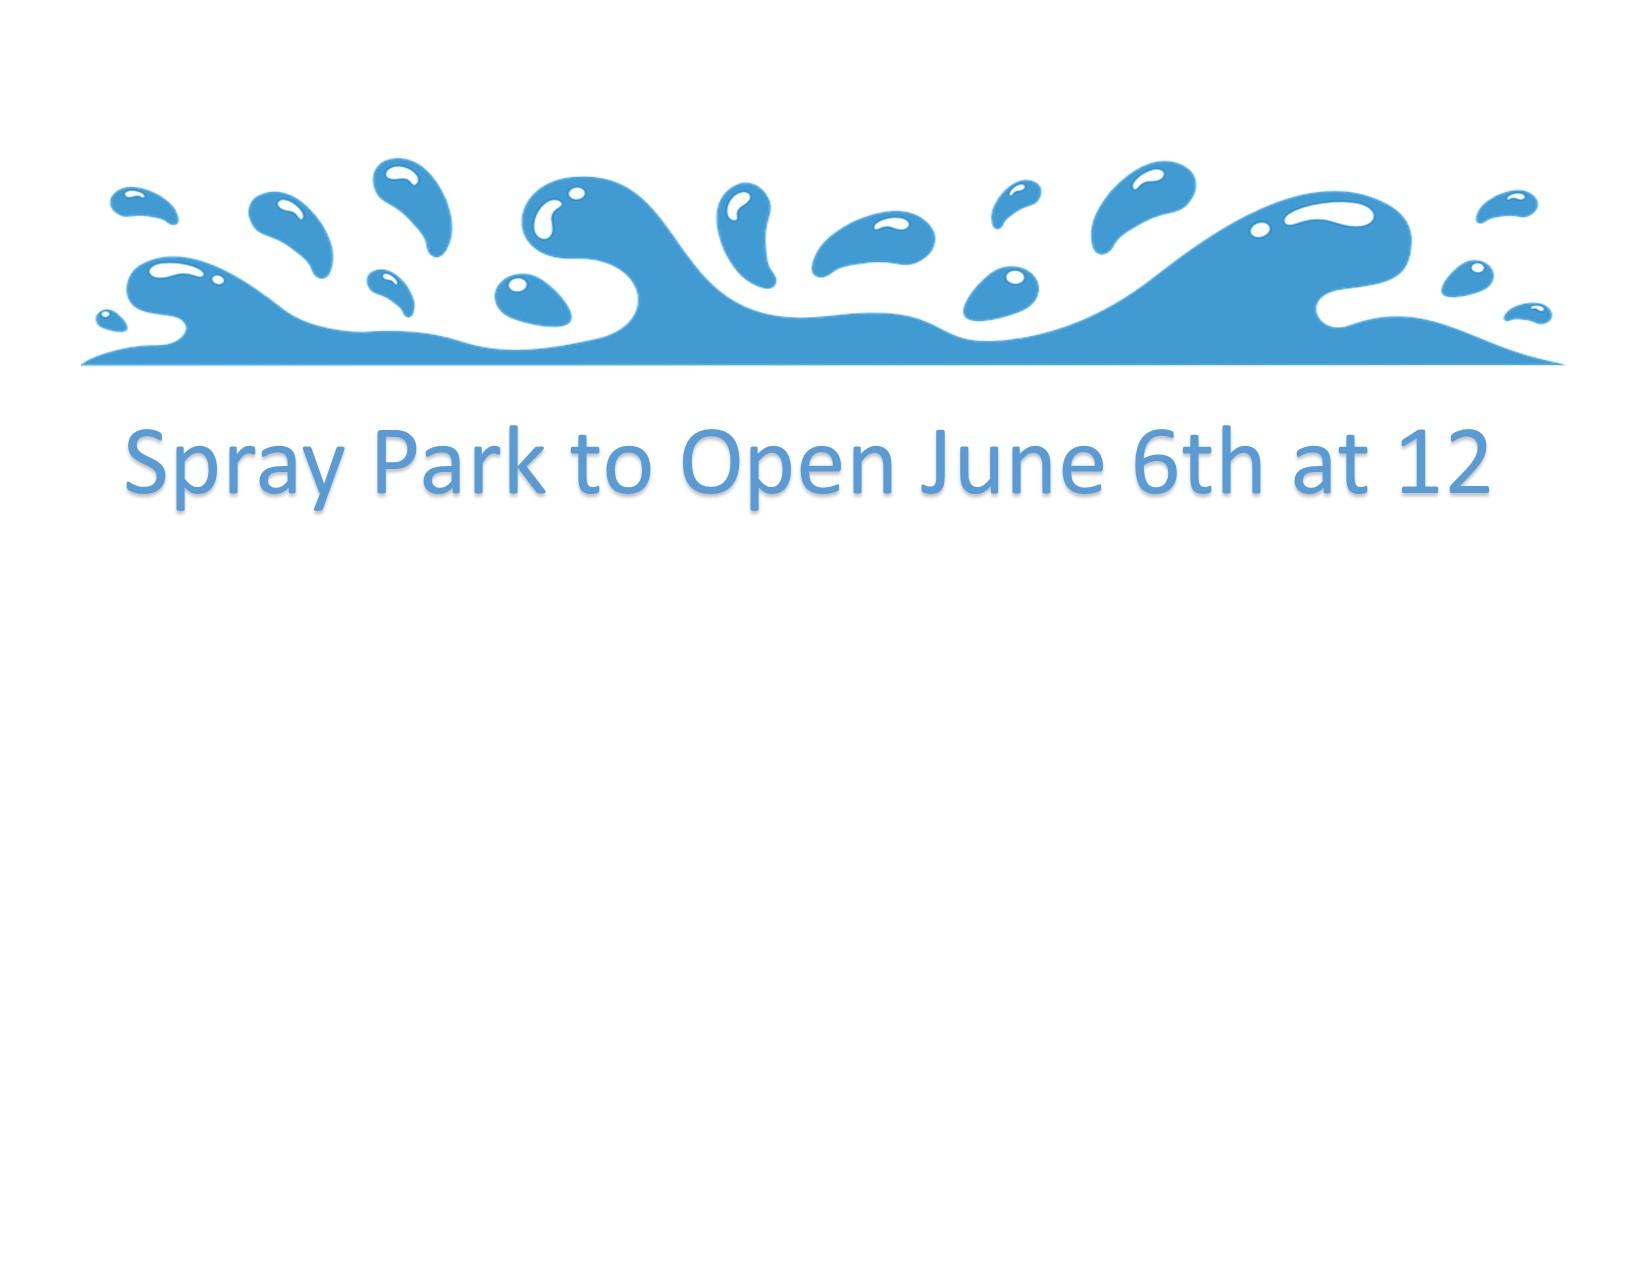 Spray Park Update - Click Here